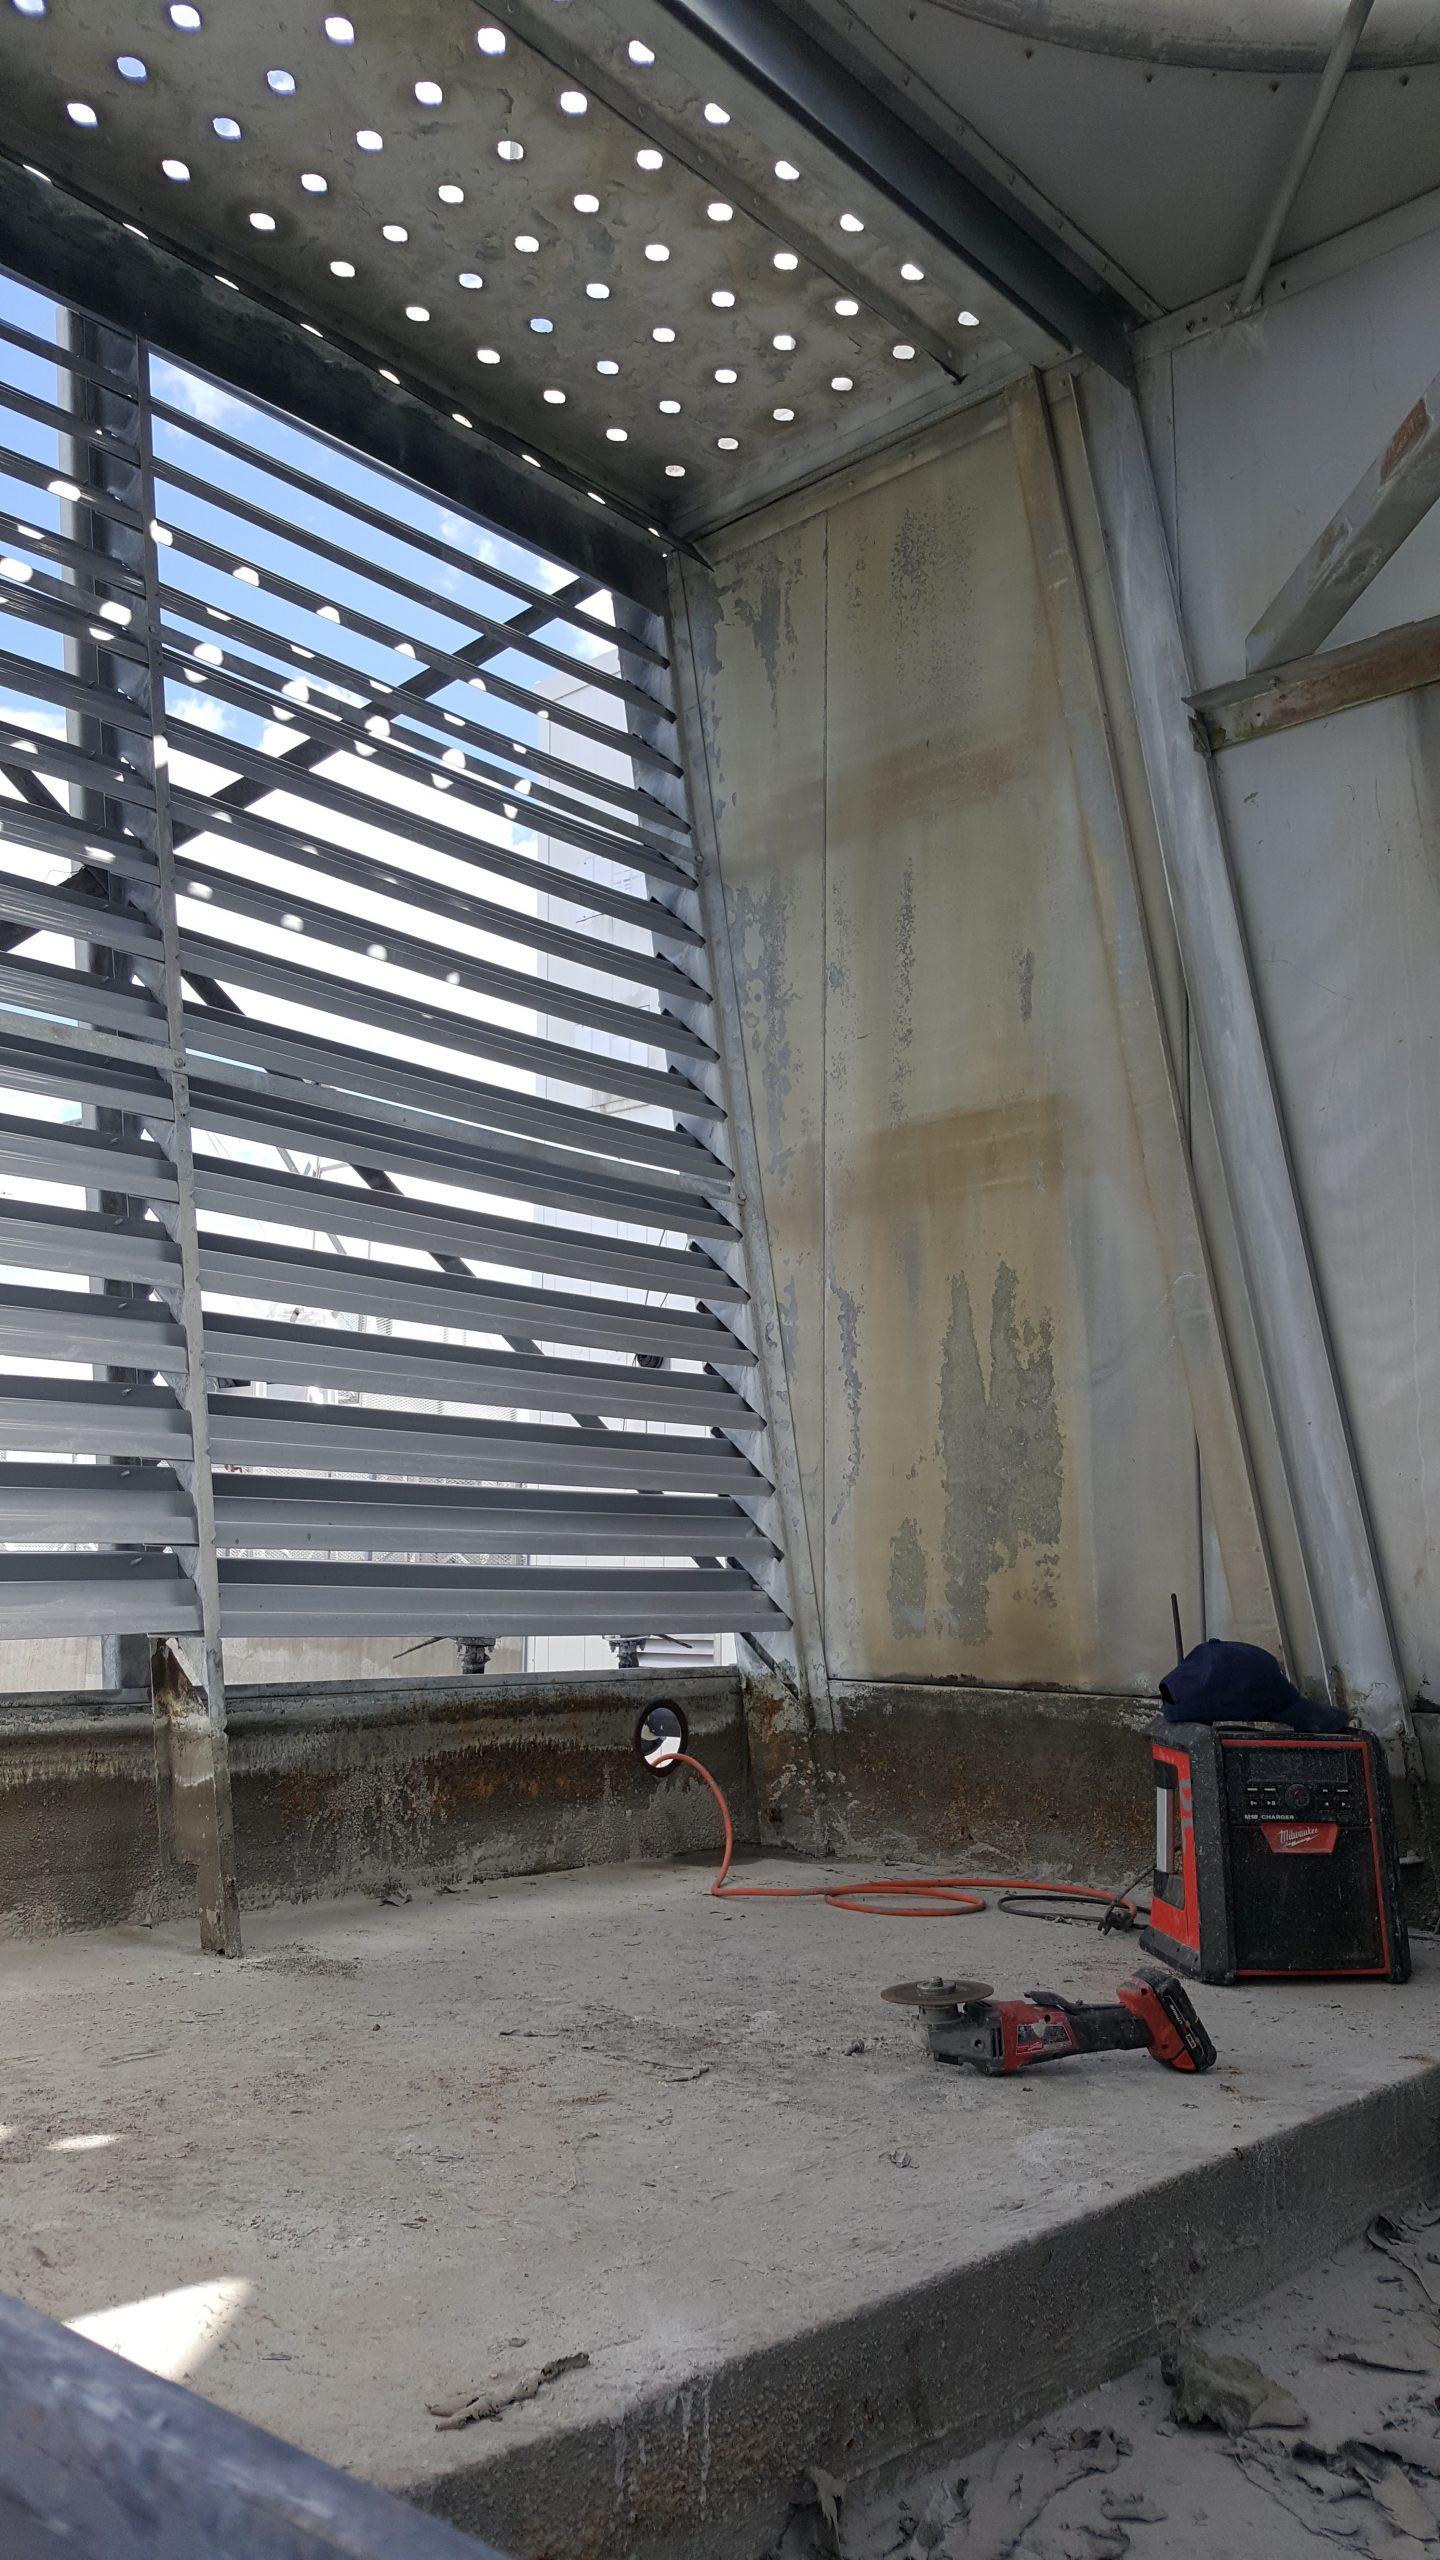 interior cross flow tower mid repair, part way through grinding